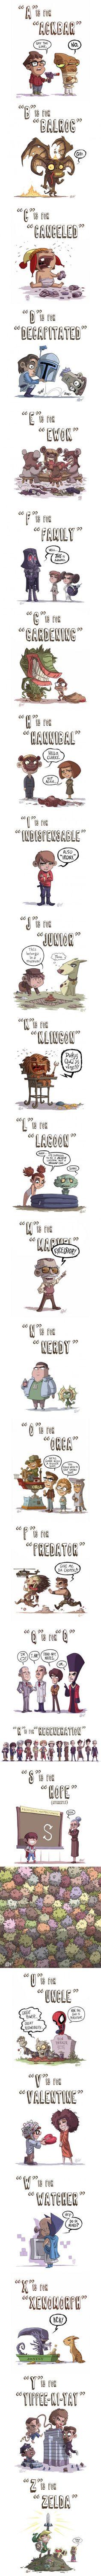 Geeky ABCs. Awww....'C' :(